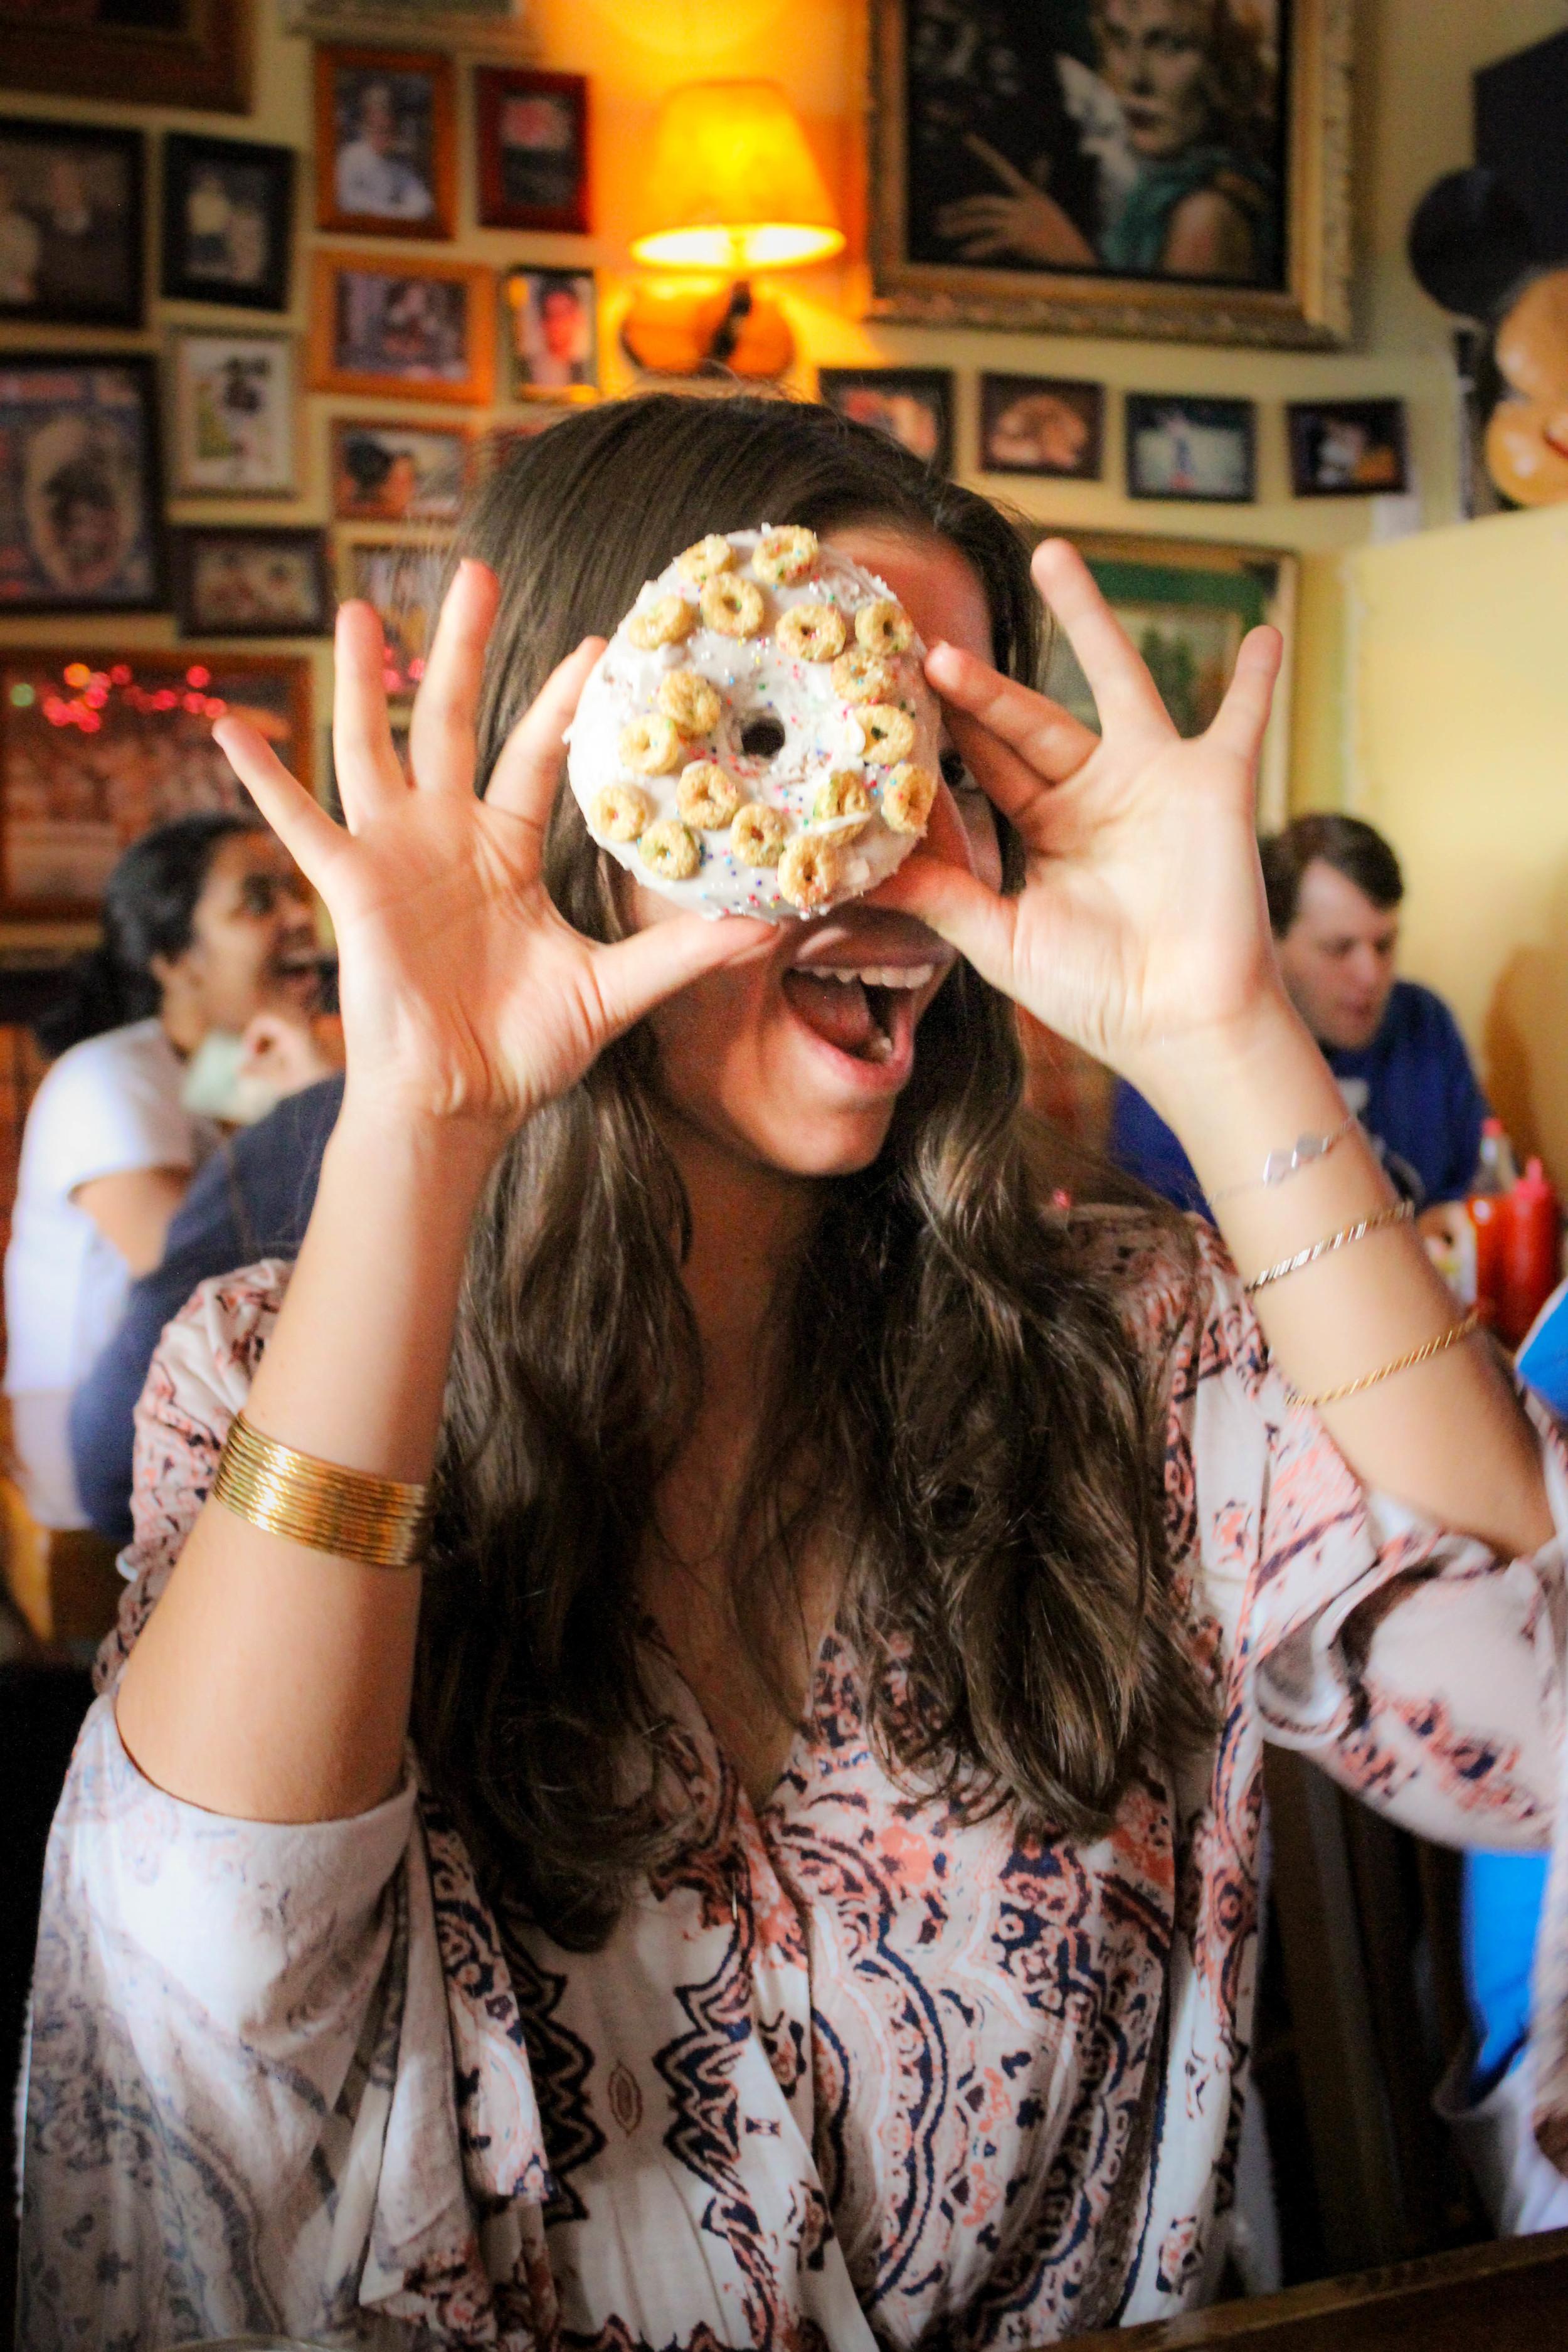 Zehra having fun with the  Cap'n crunch cake doughnut